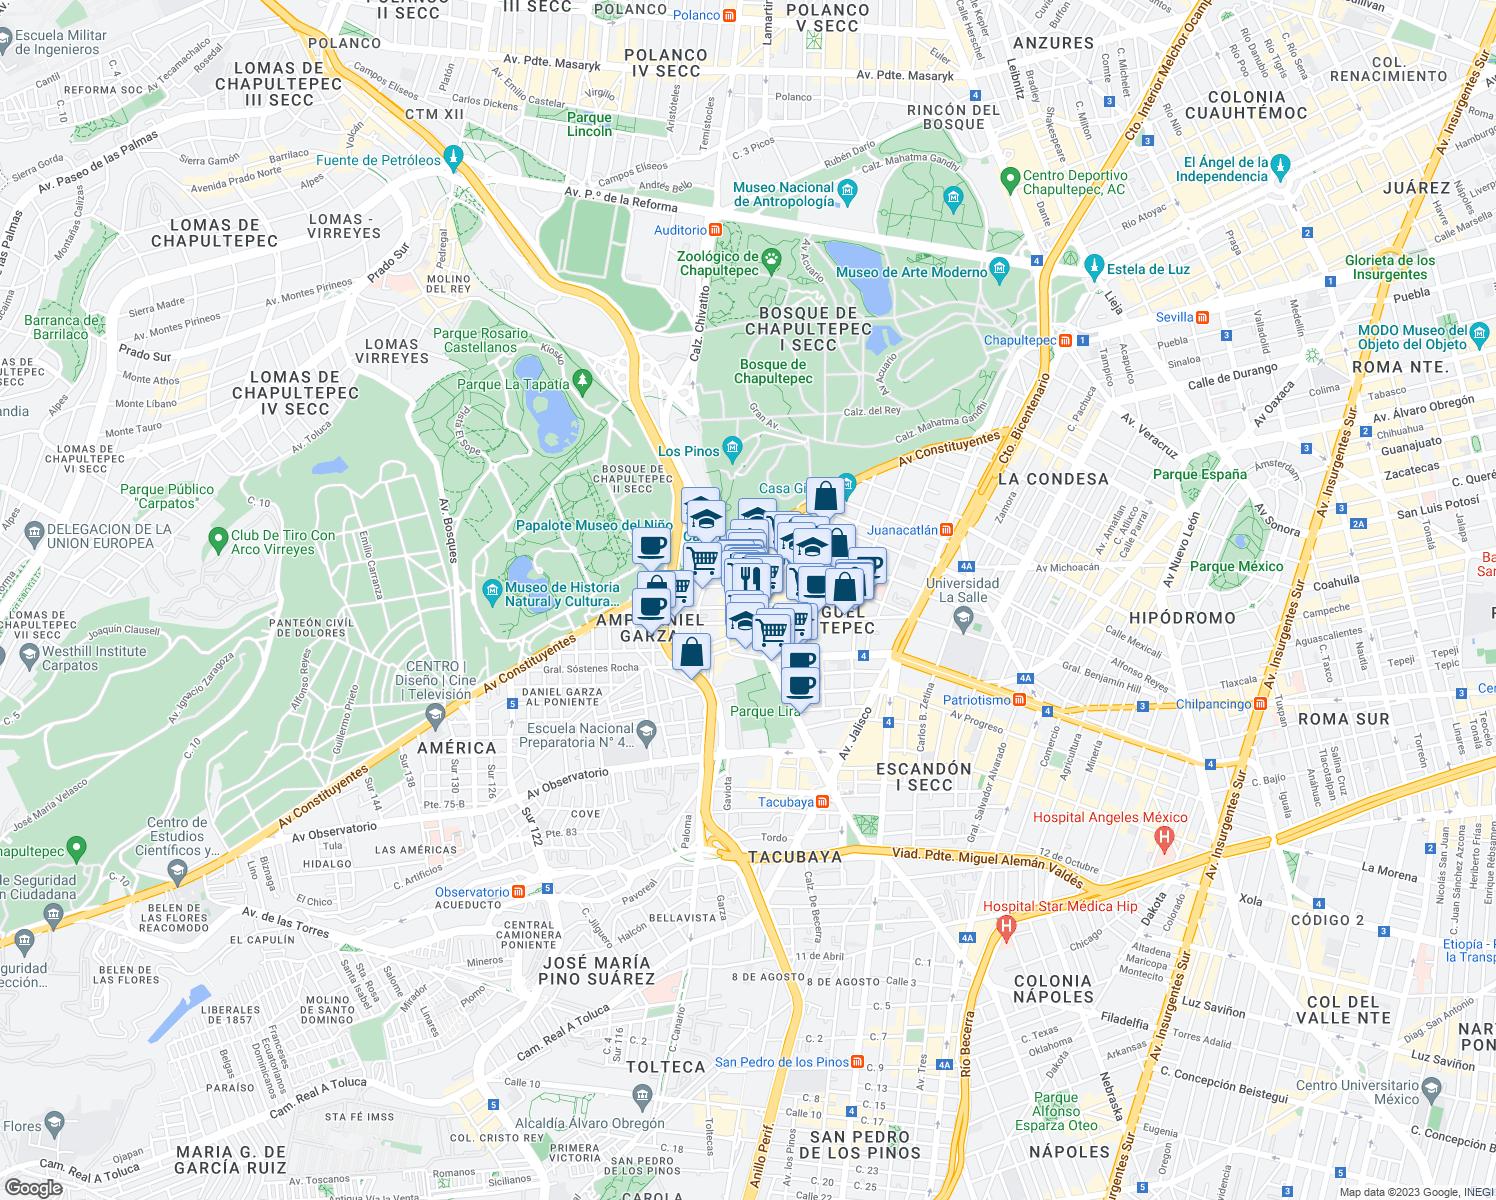 31 Parque Lira, Mexico City D.F. - Walk Score